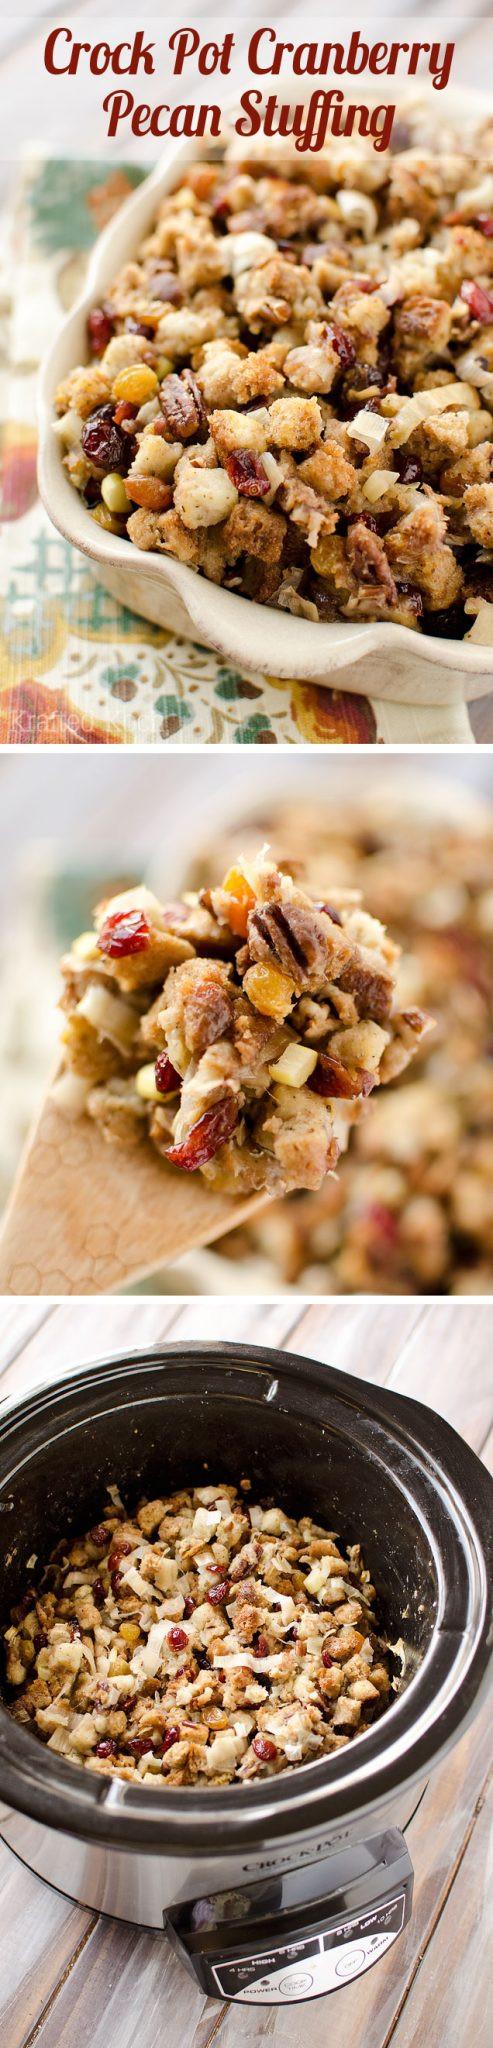 Crock Pot Thanksgiving Side Dishes  Crock Pot Cranberry Pecan Stuffing